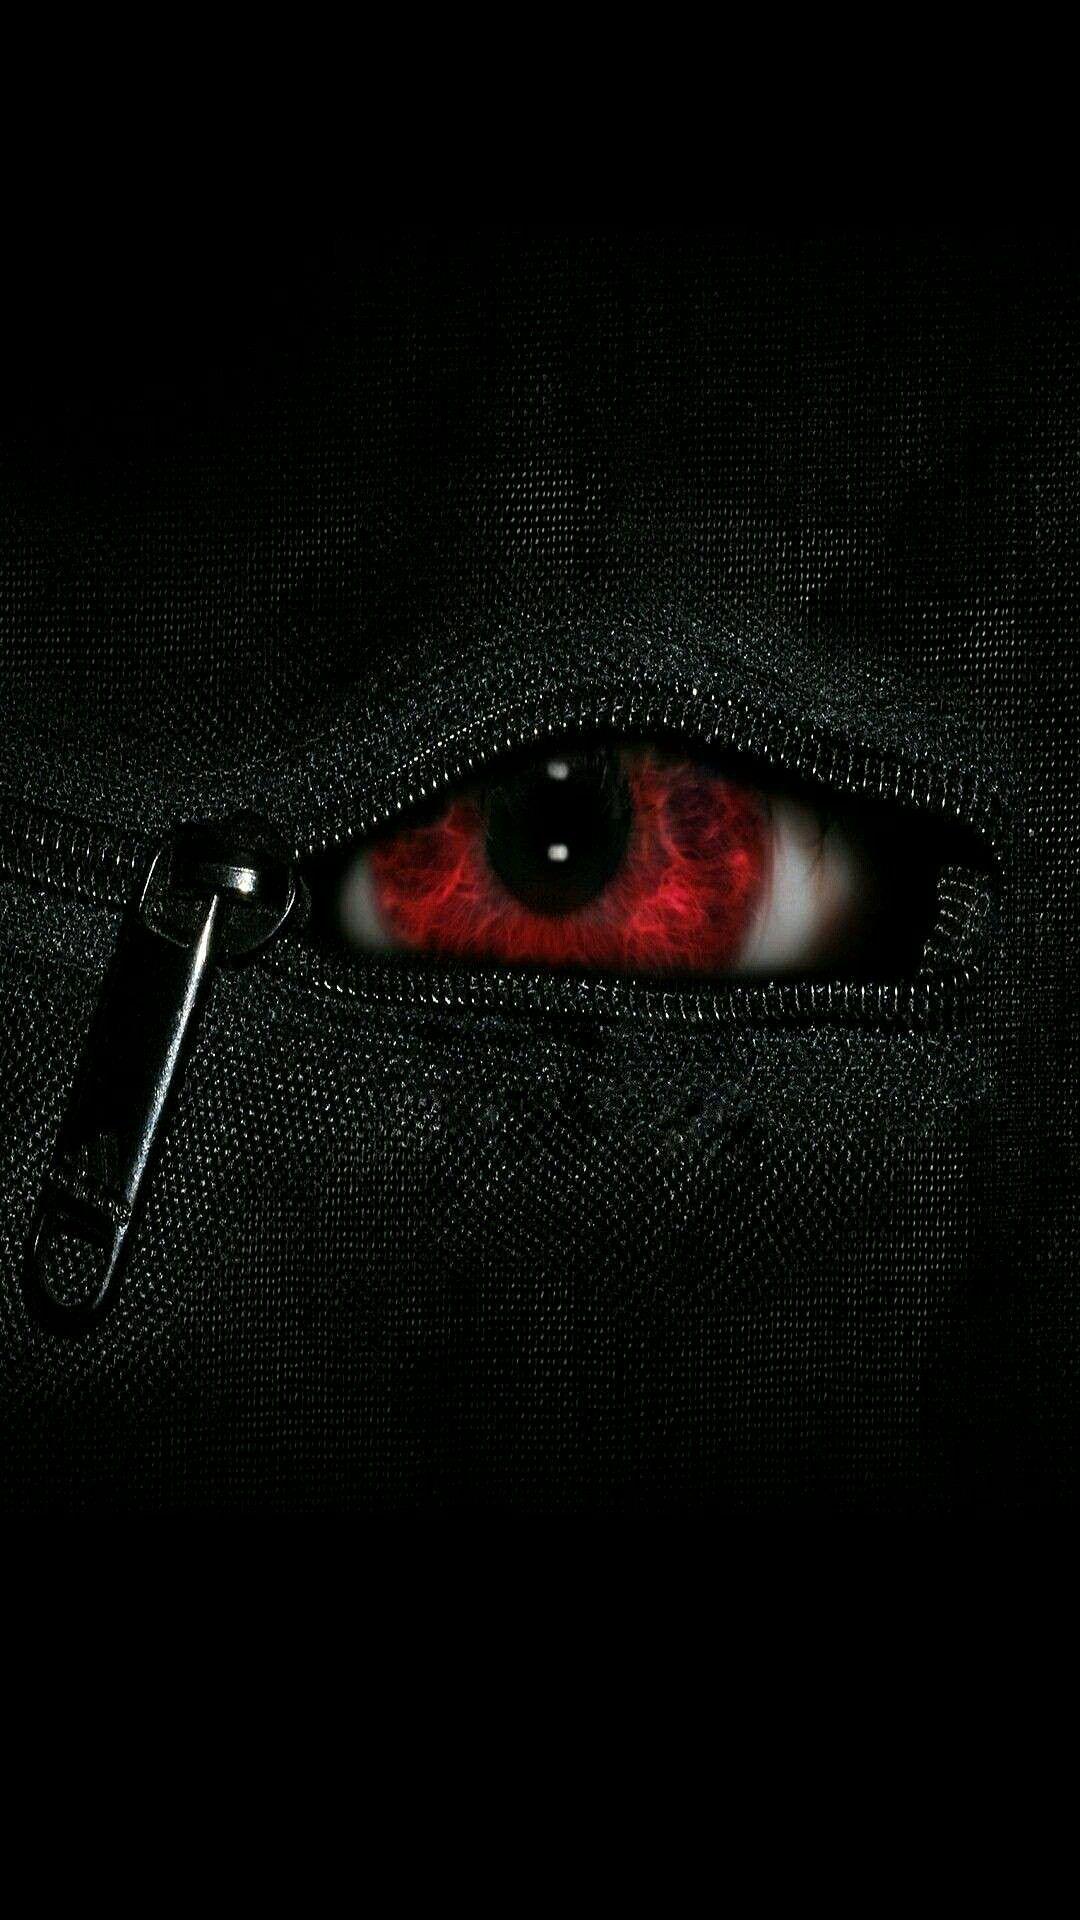 Pin by goku albert on blacky Halloween wallpaper